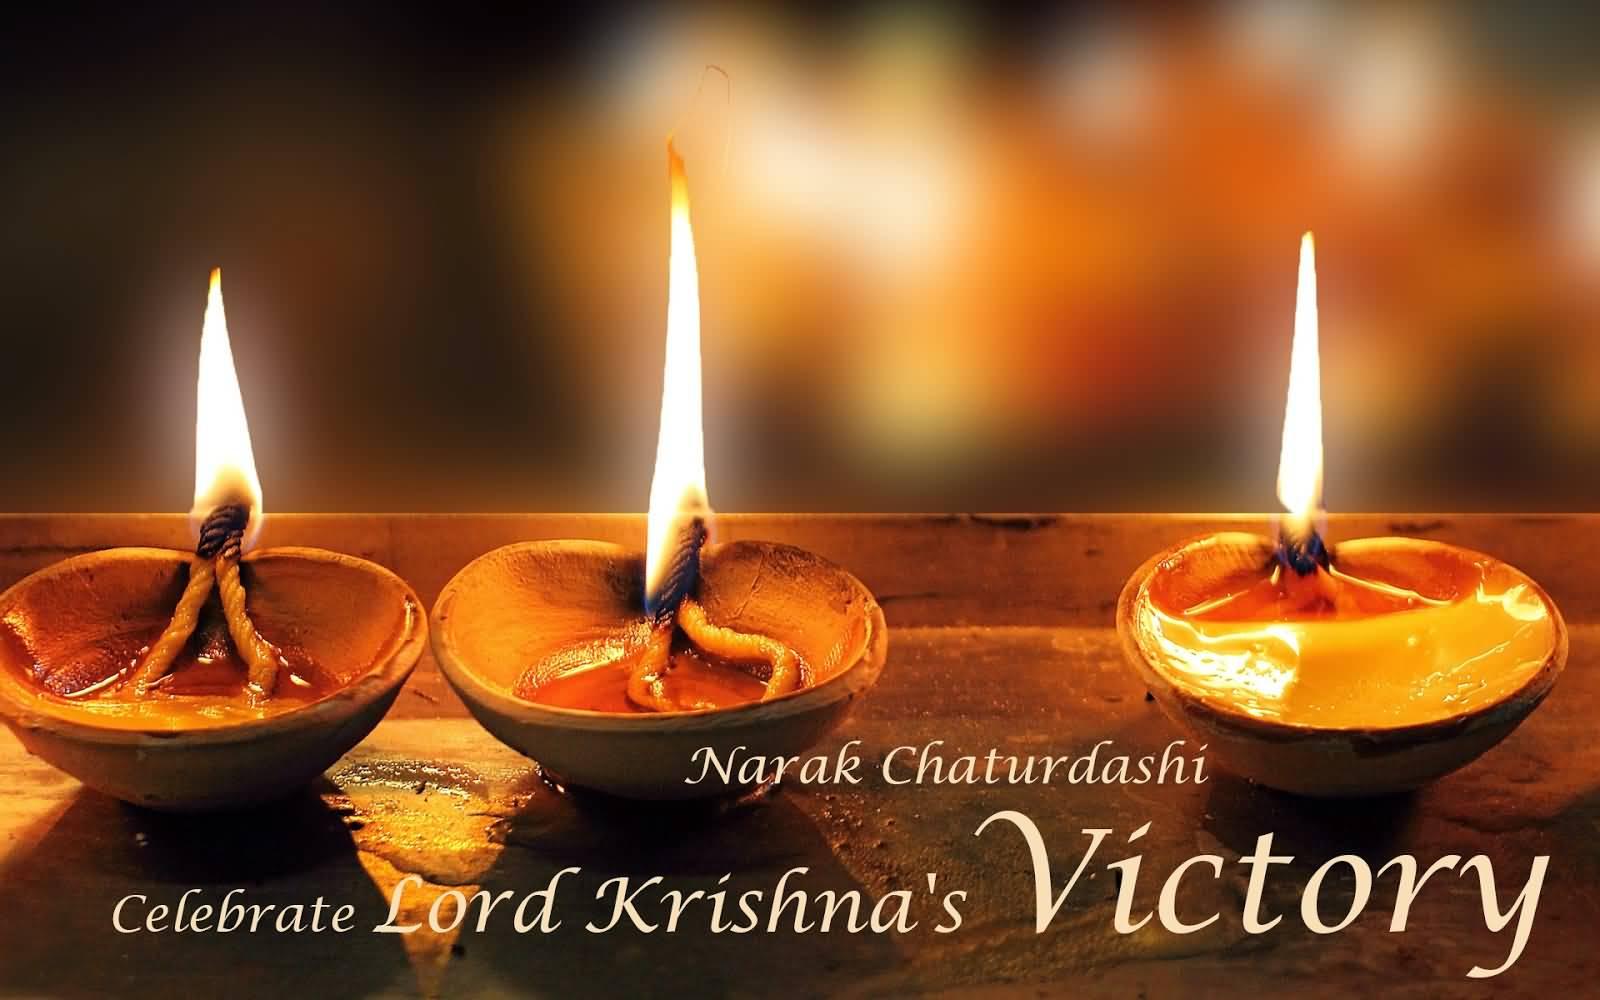 Happy Narak Chaturdashi Hd Images Free Download